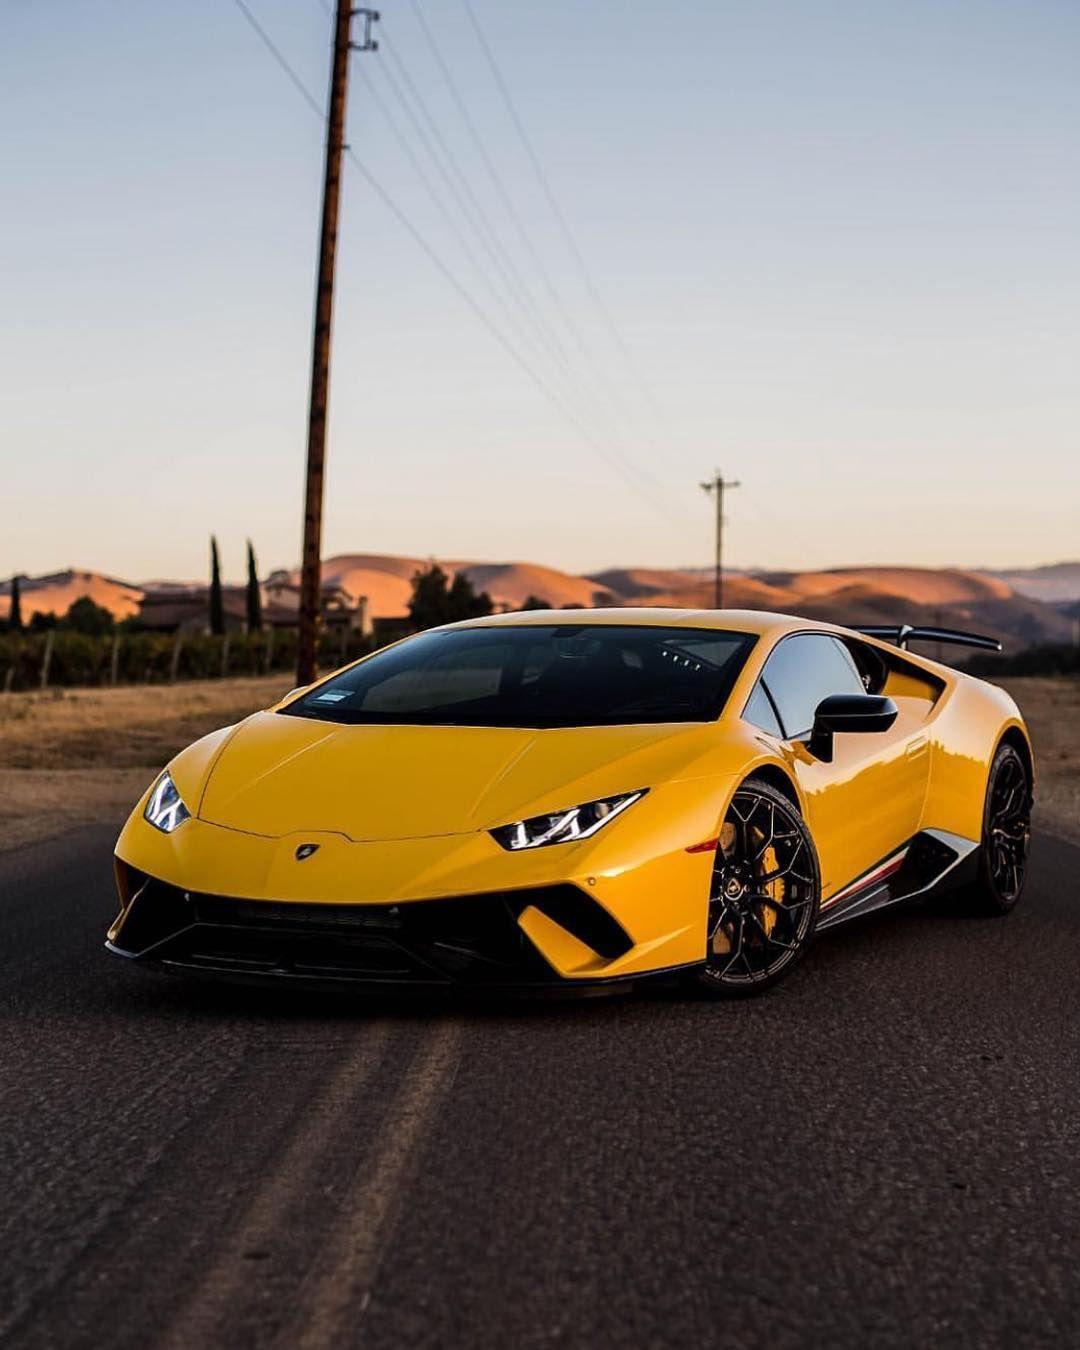 Performante Supercar Super Luxury Cars Super Cars Lamborghini Cars